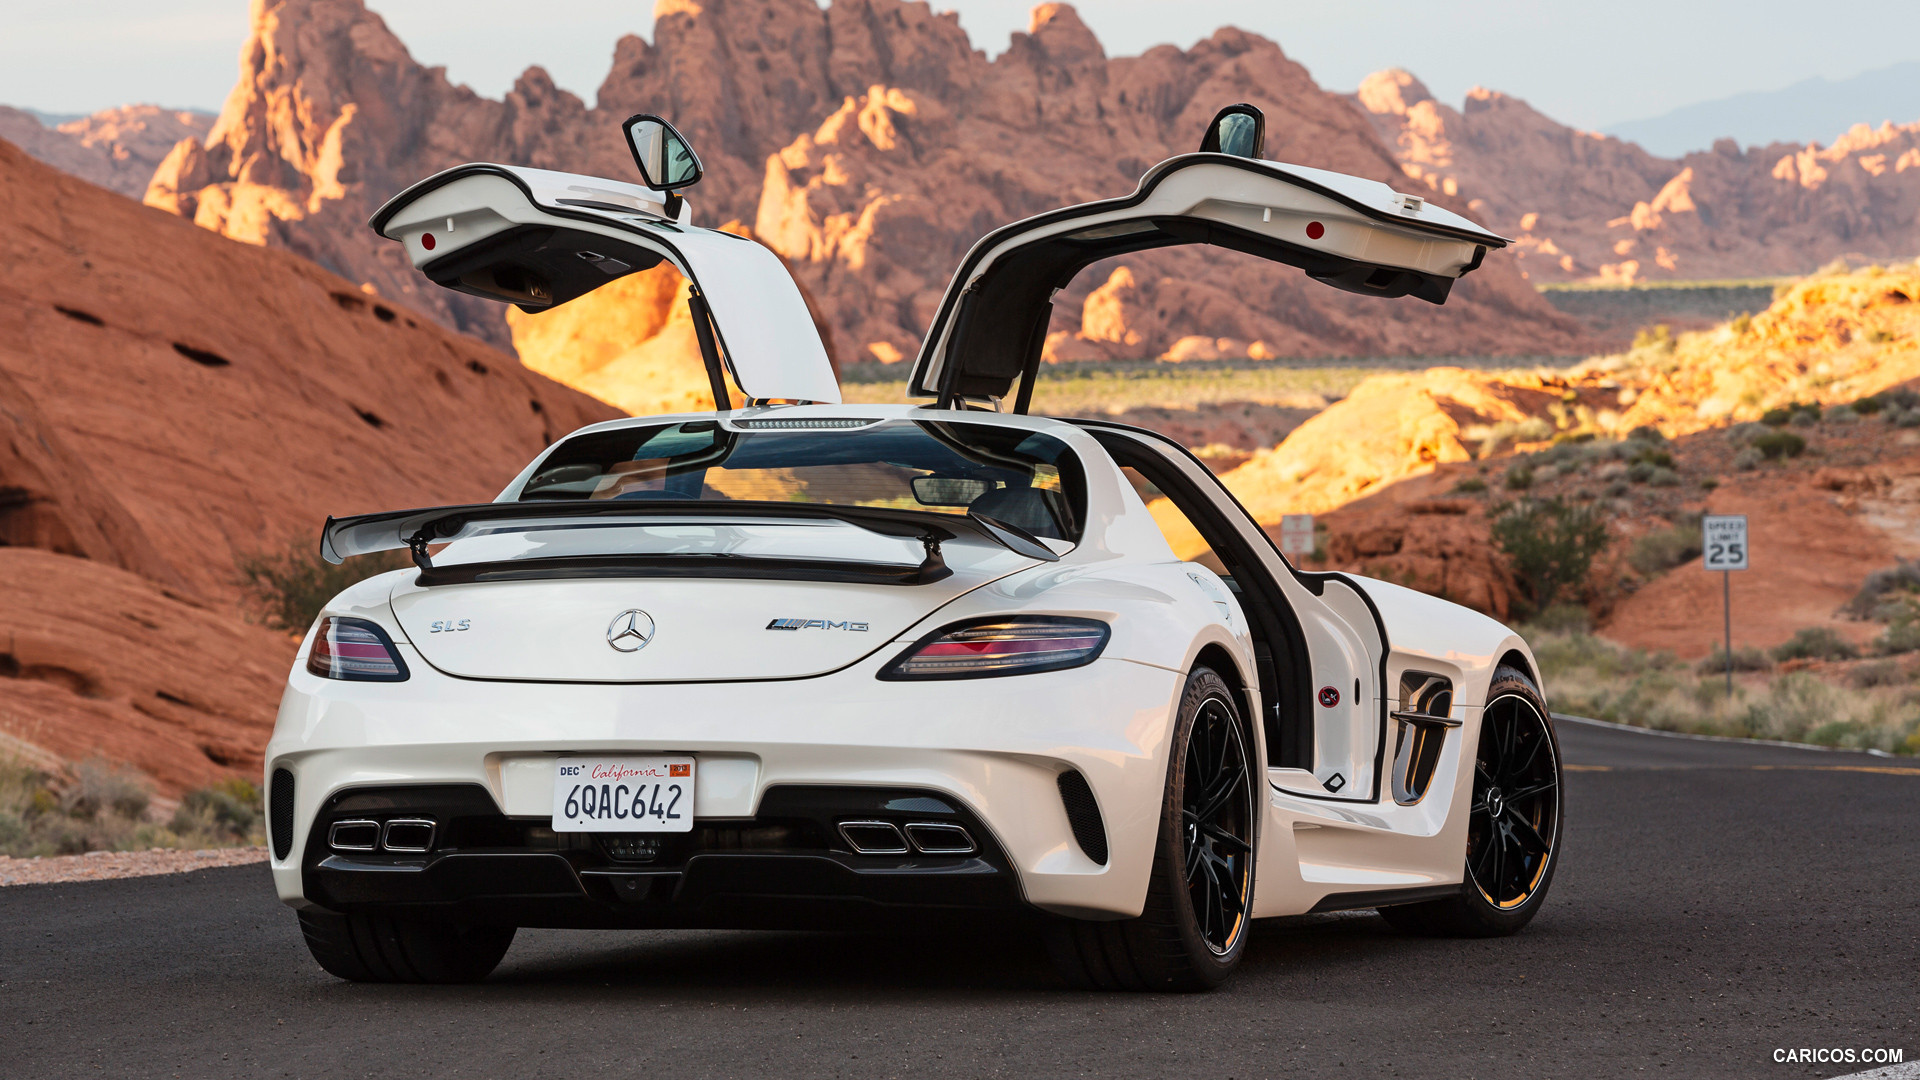 new mercedes benz sls amg coupe black series pictures - 2015 Mercedes Benz Sls Amg Black Series